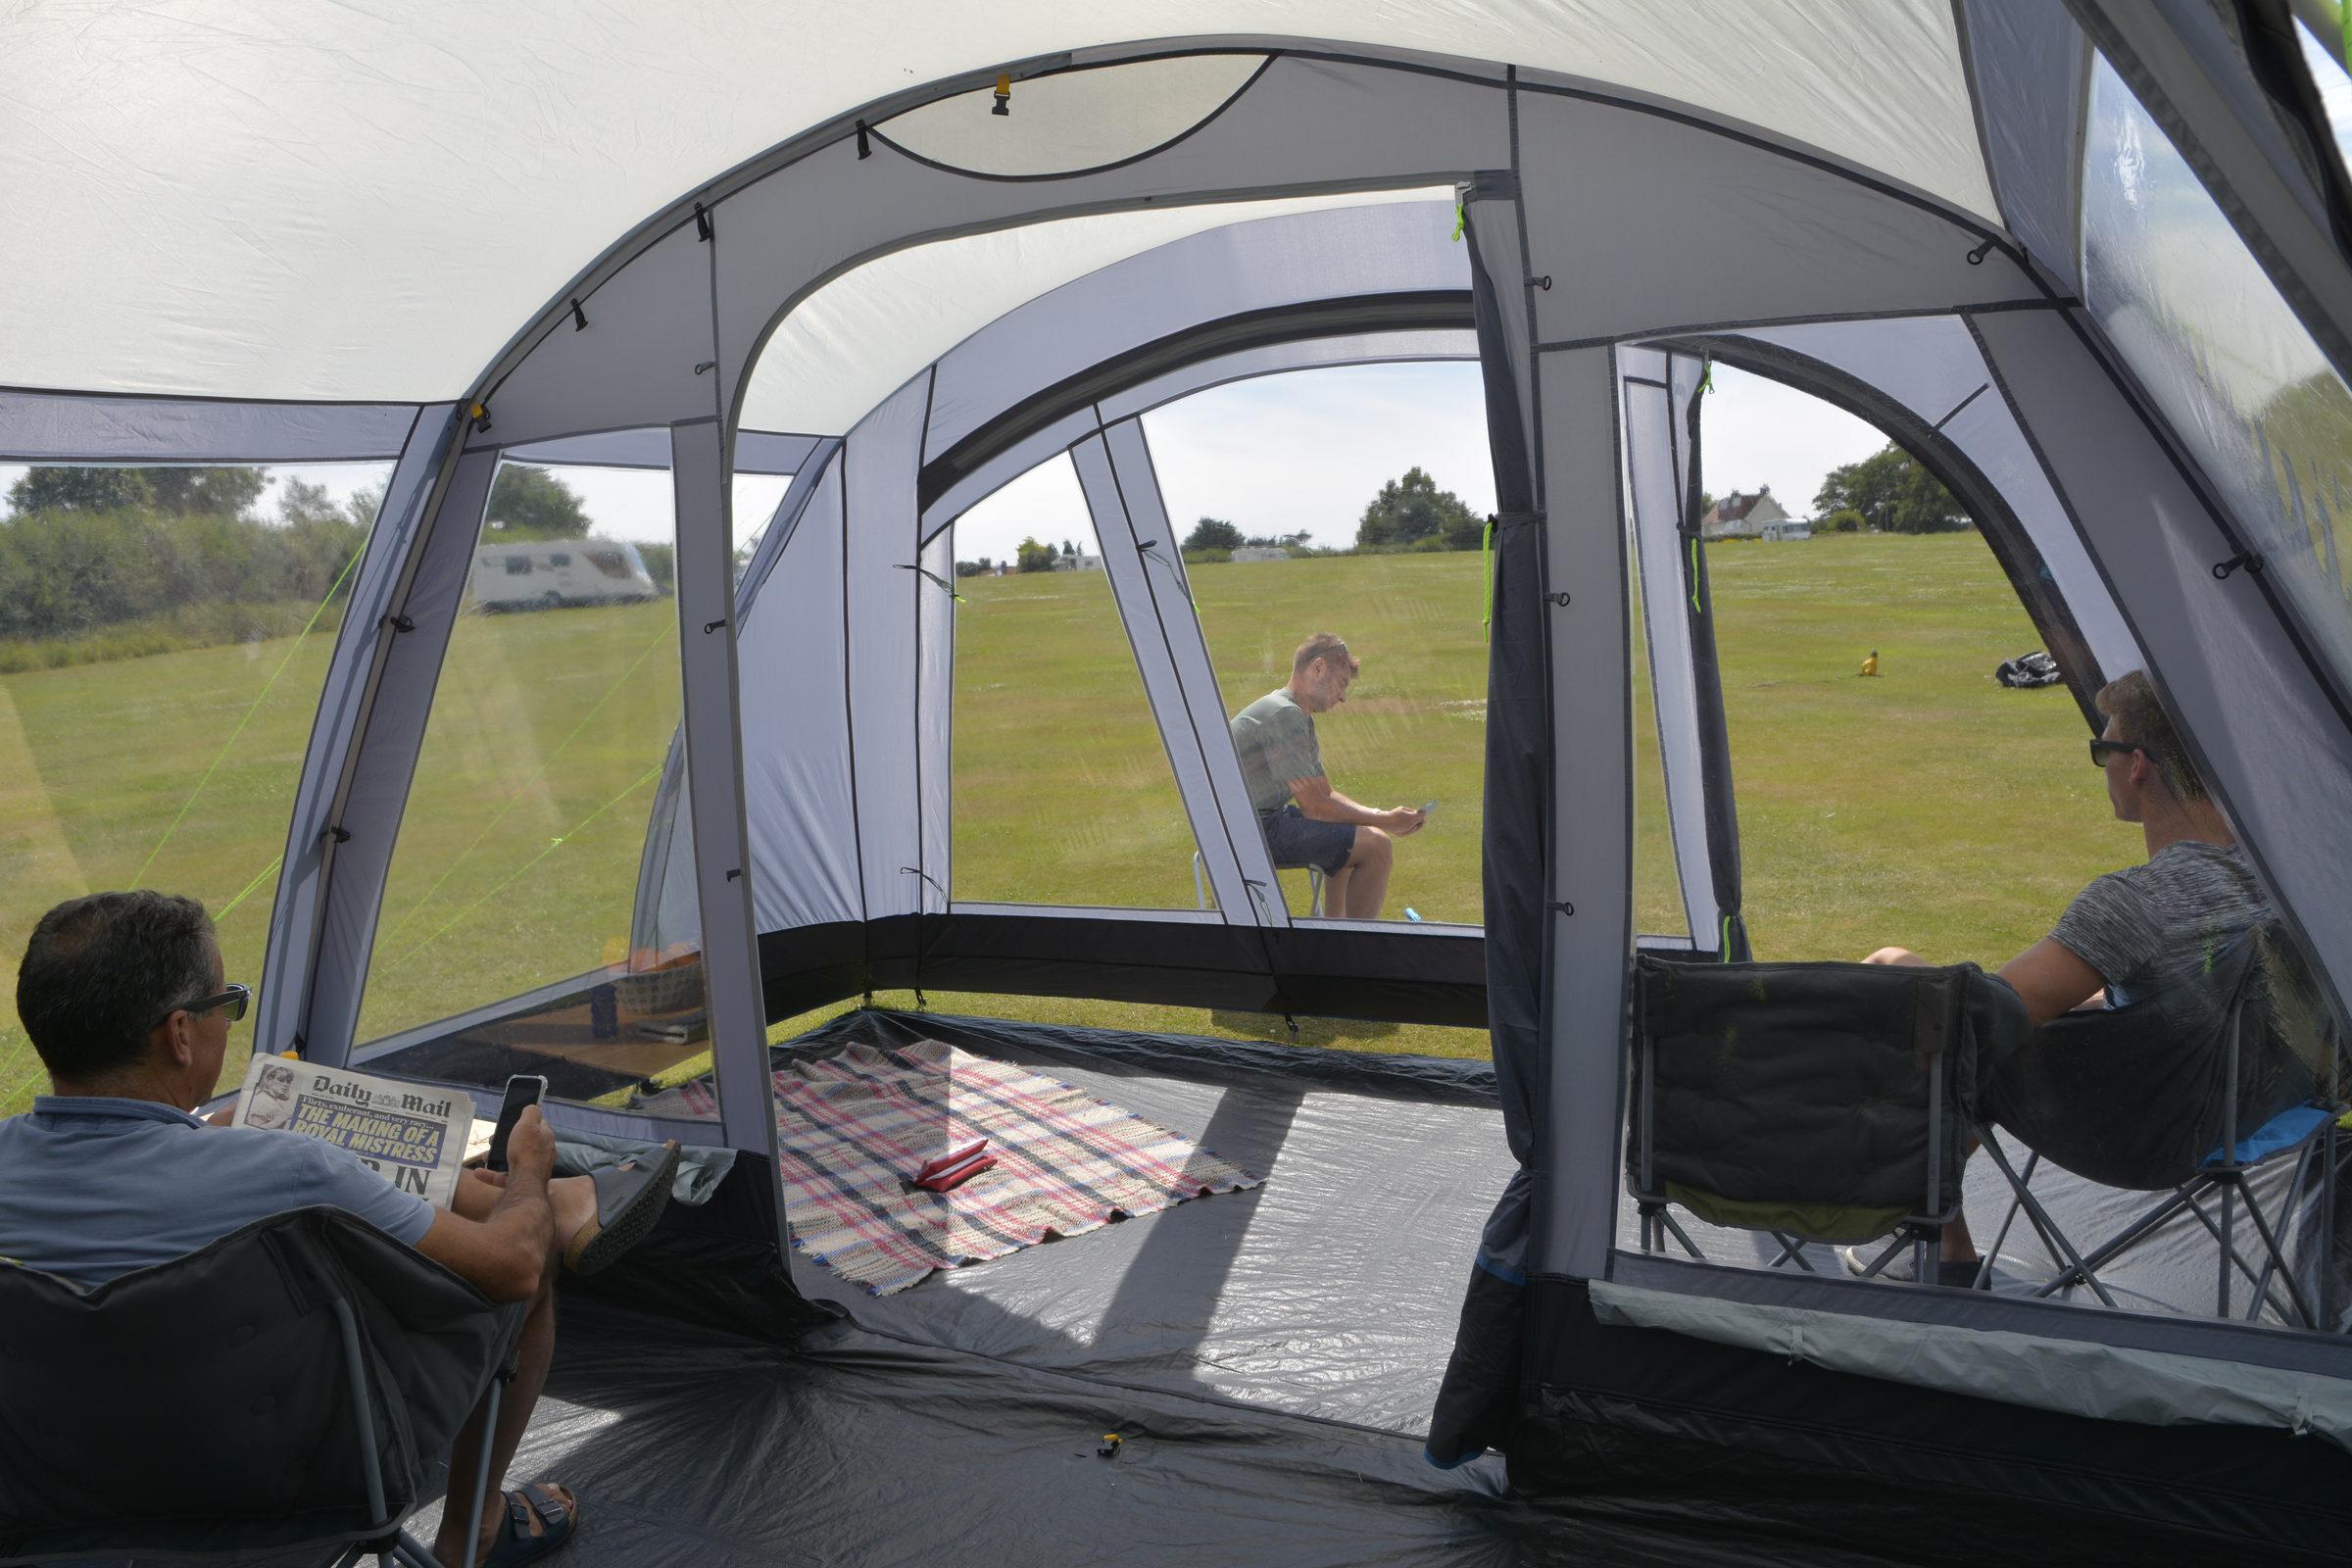 Kampa Texel 6 Poled Tent interior